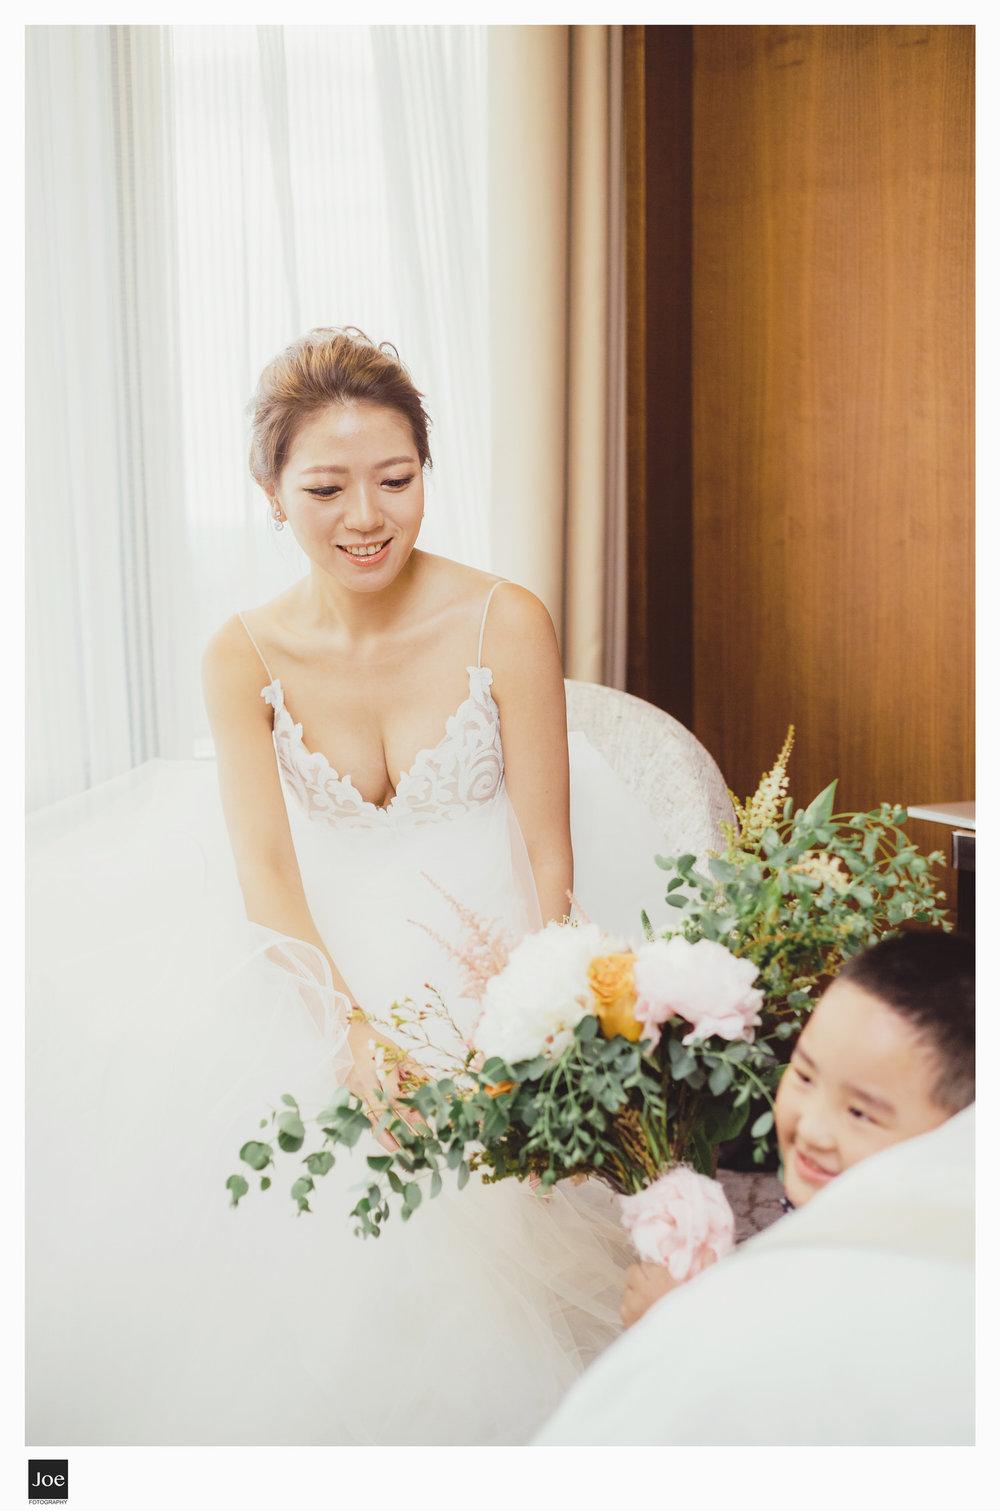 wedding-photography-shangri-la-far-eastern-plaza-hotel-ariel-sam-joe-fotography-111.jpg